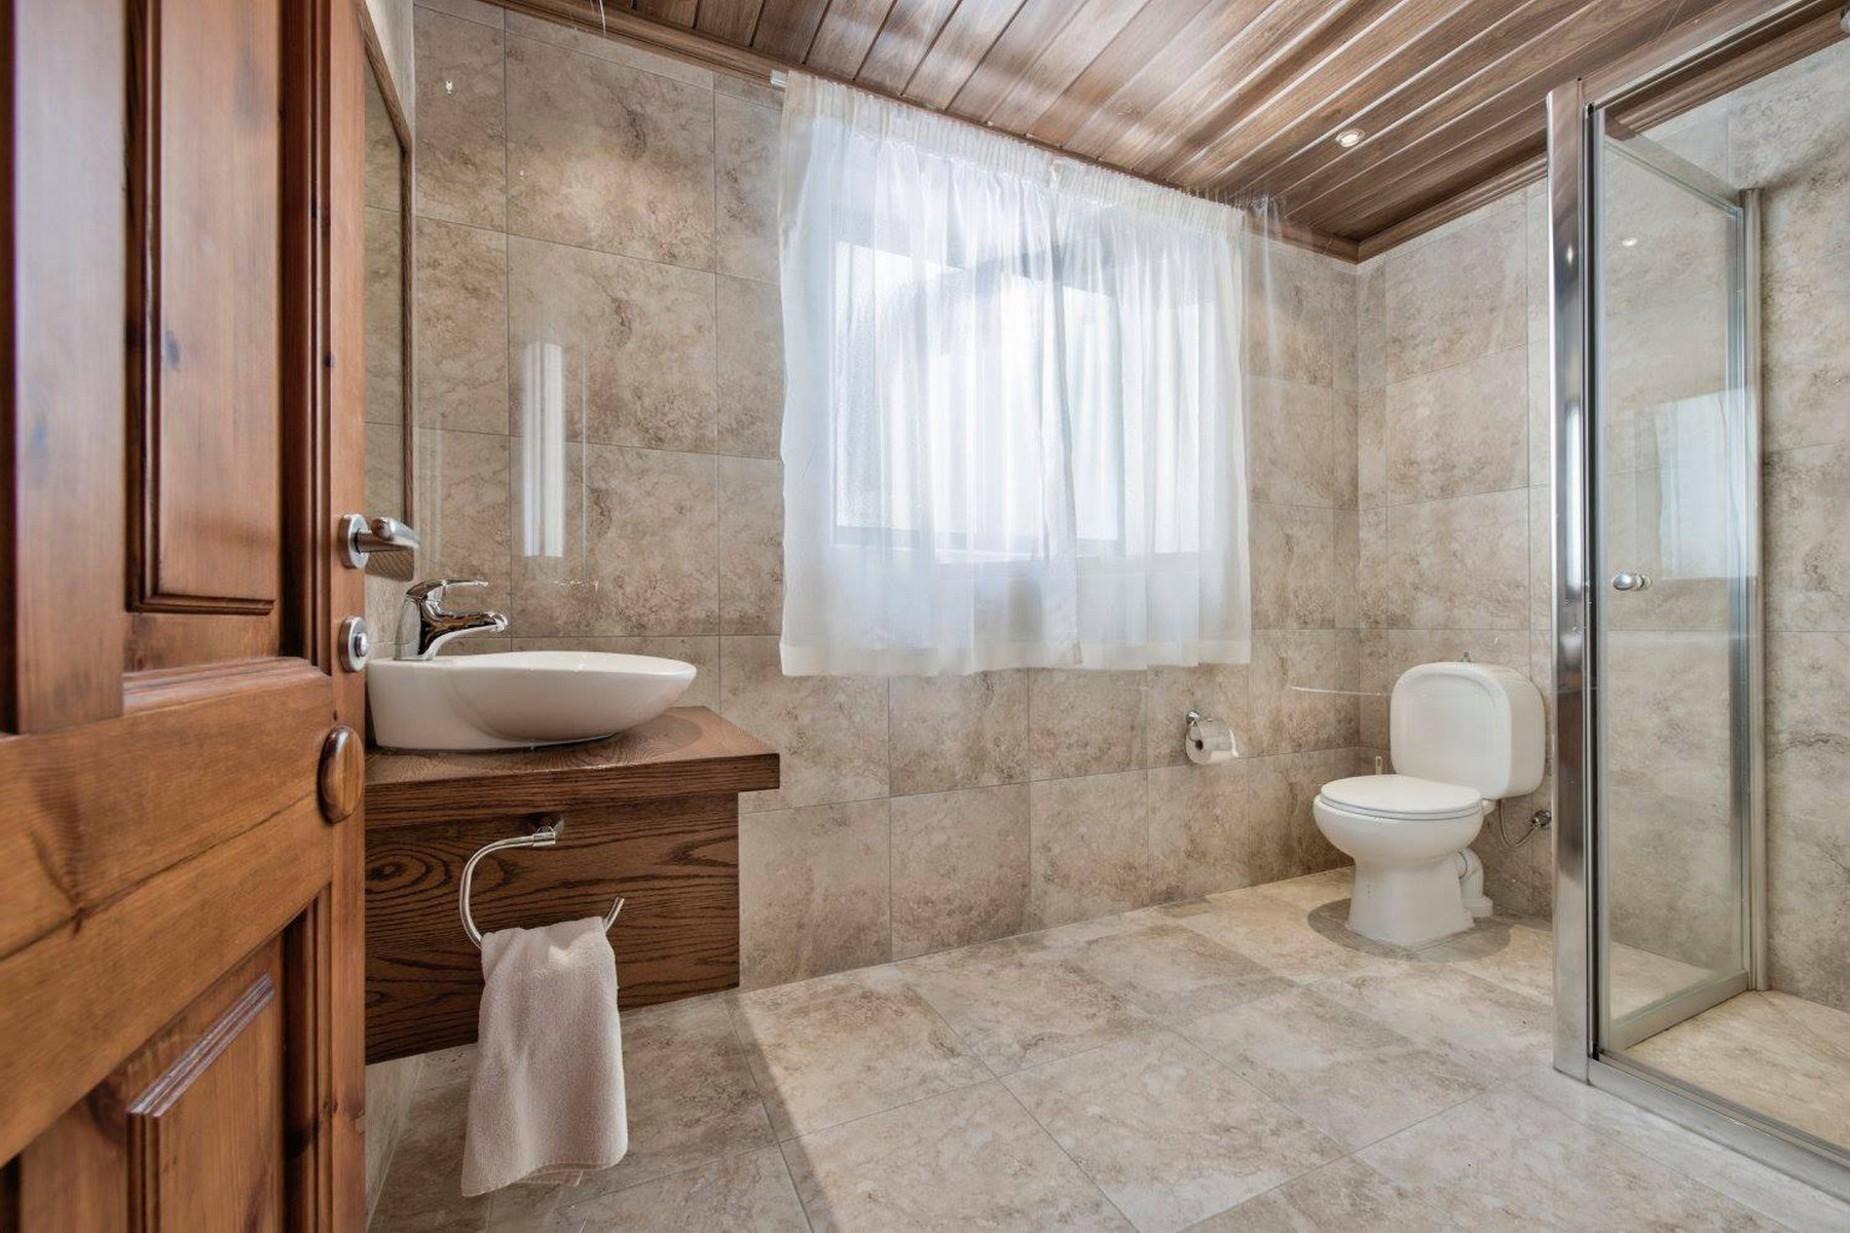 5 bed Villa For Rent in Mellieha, Mellieha - thumb 14